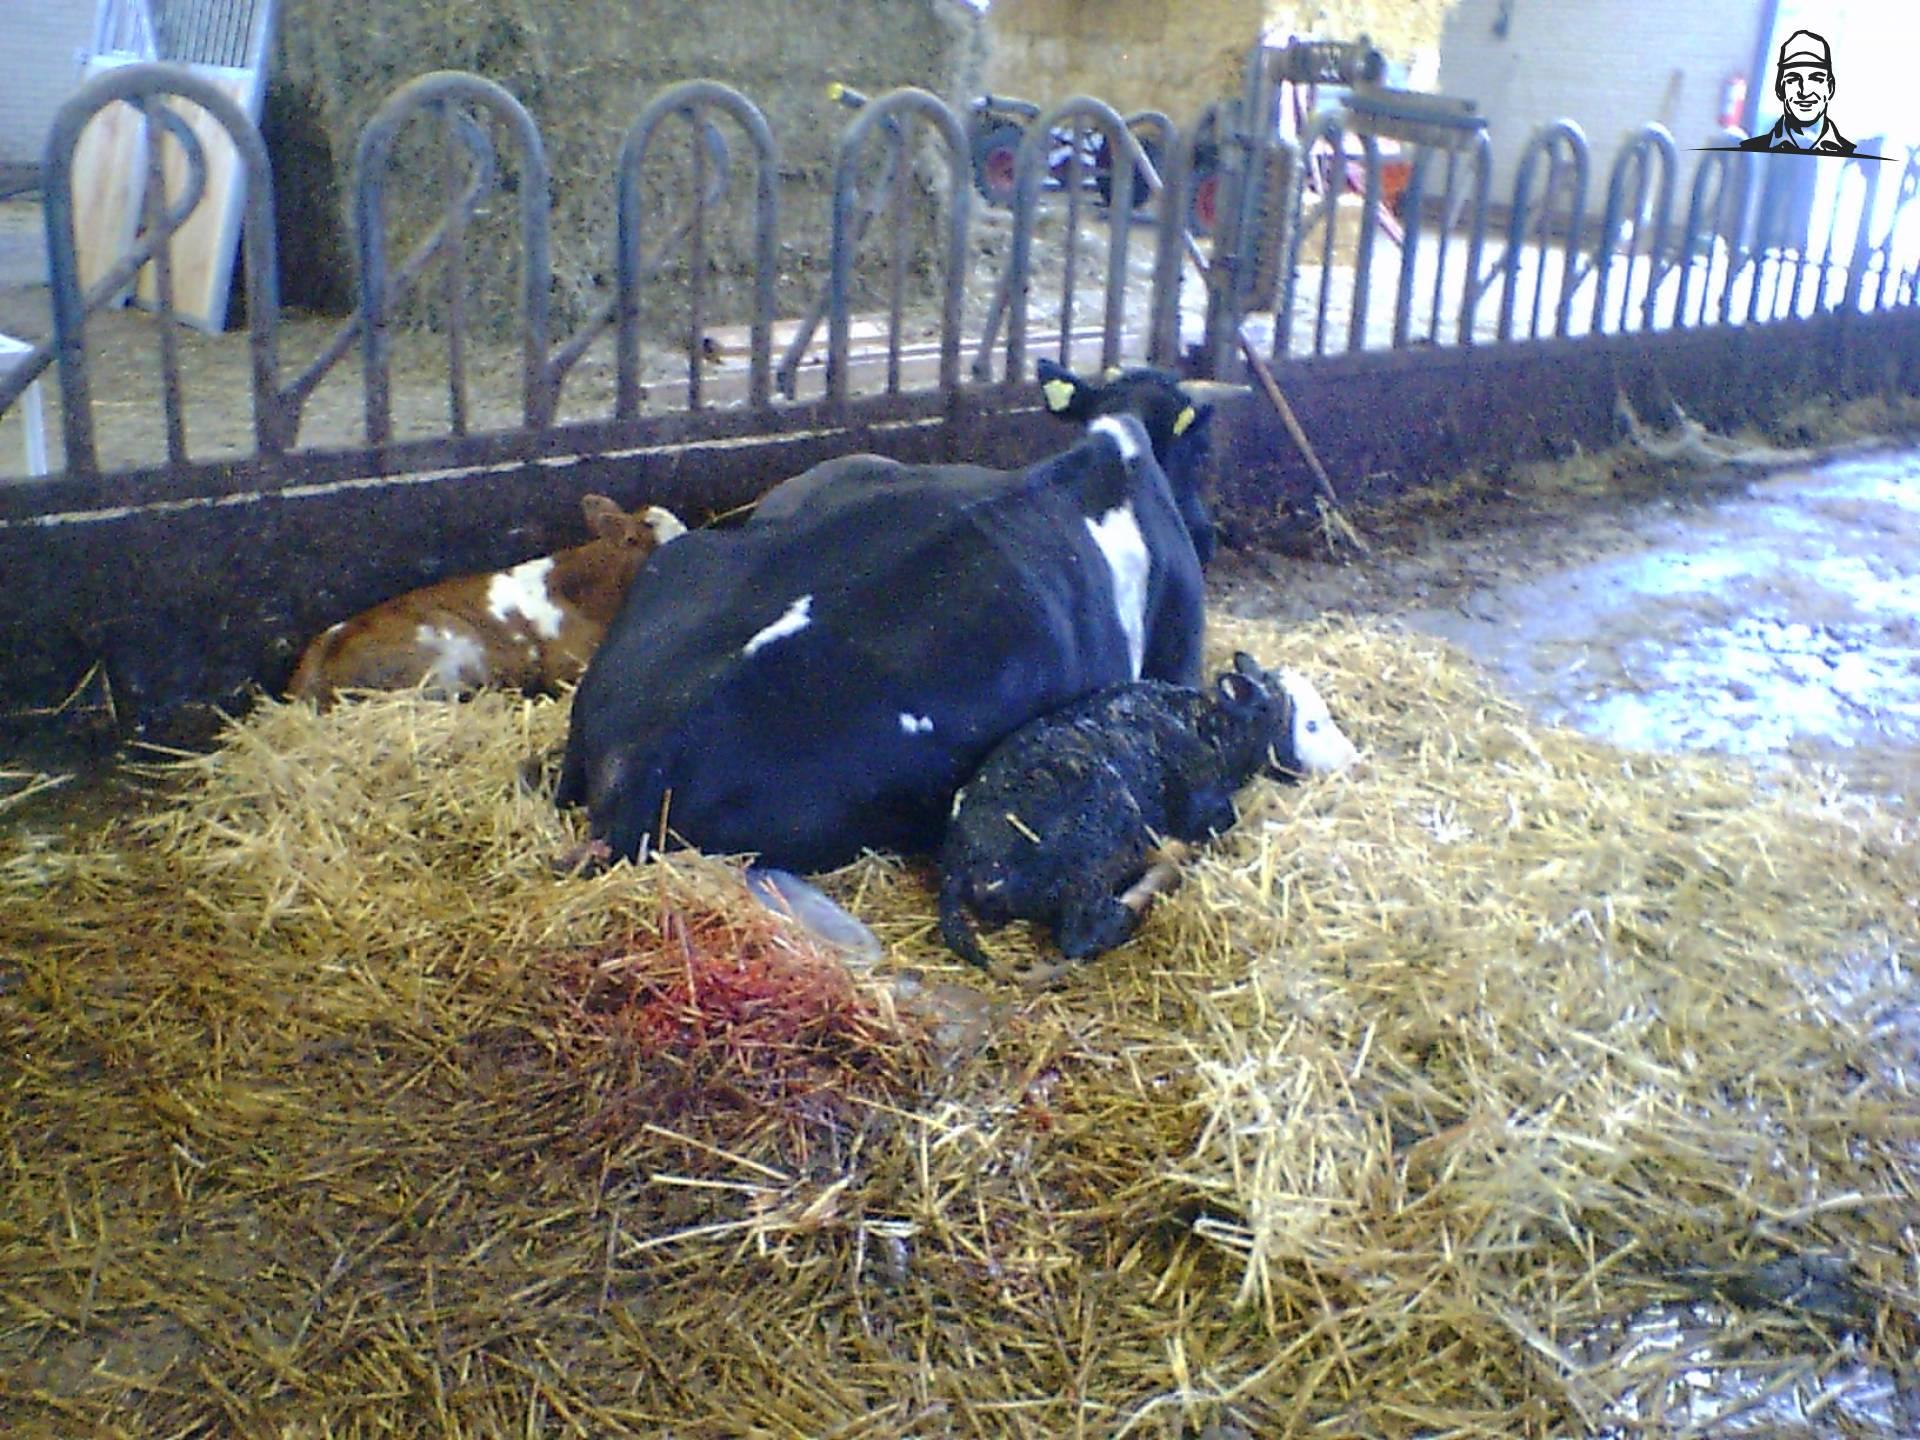 Koeien van Roy6220